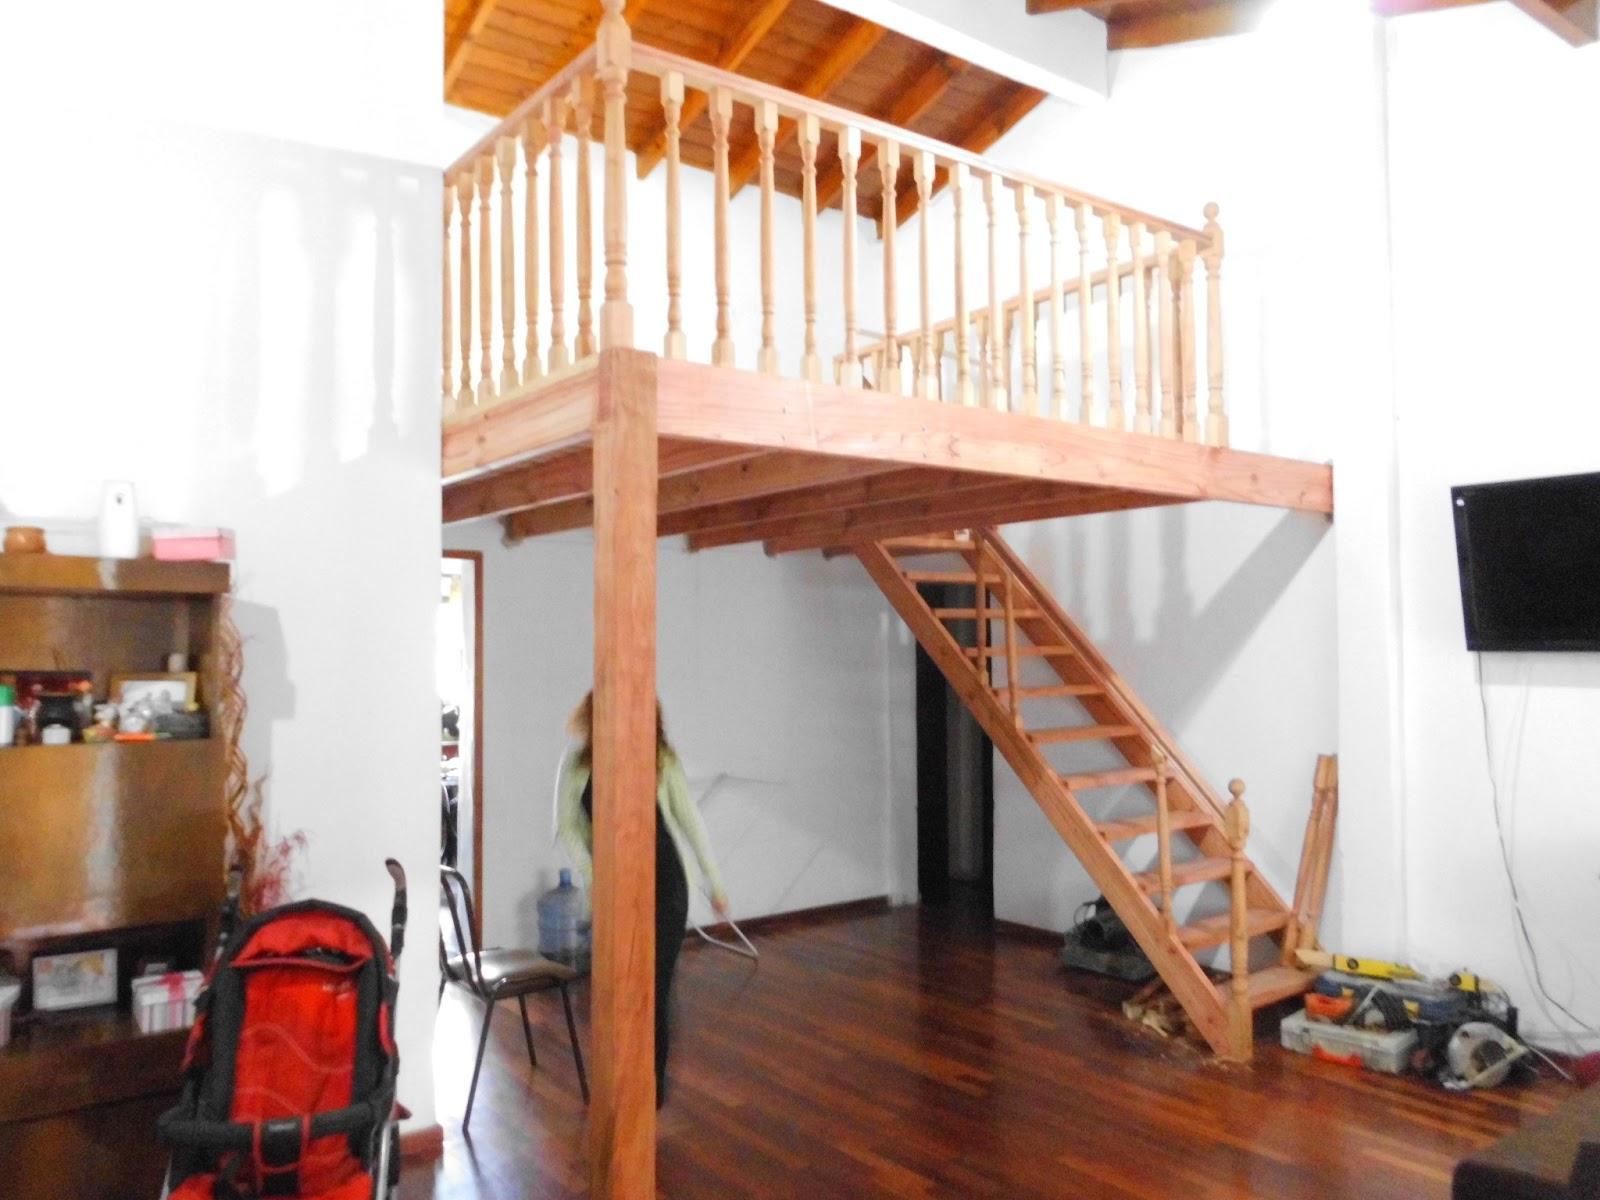 Entrepisos de madera escaleras marzo 2013 for Como hacer una escalera para entrepiso